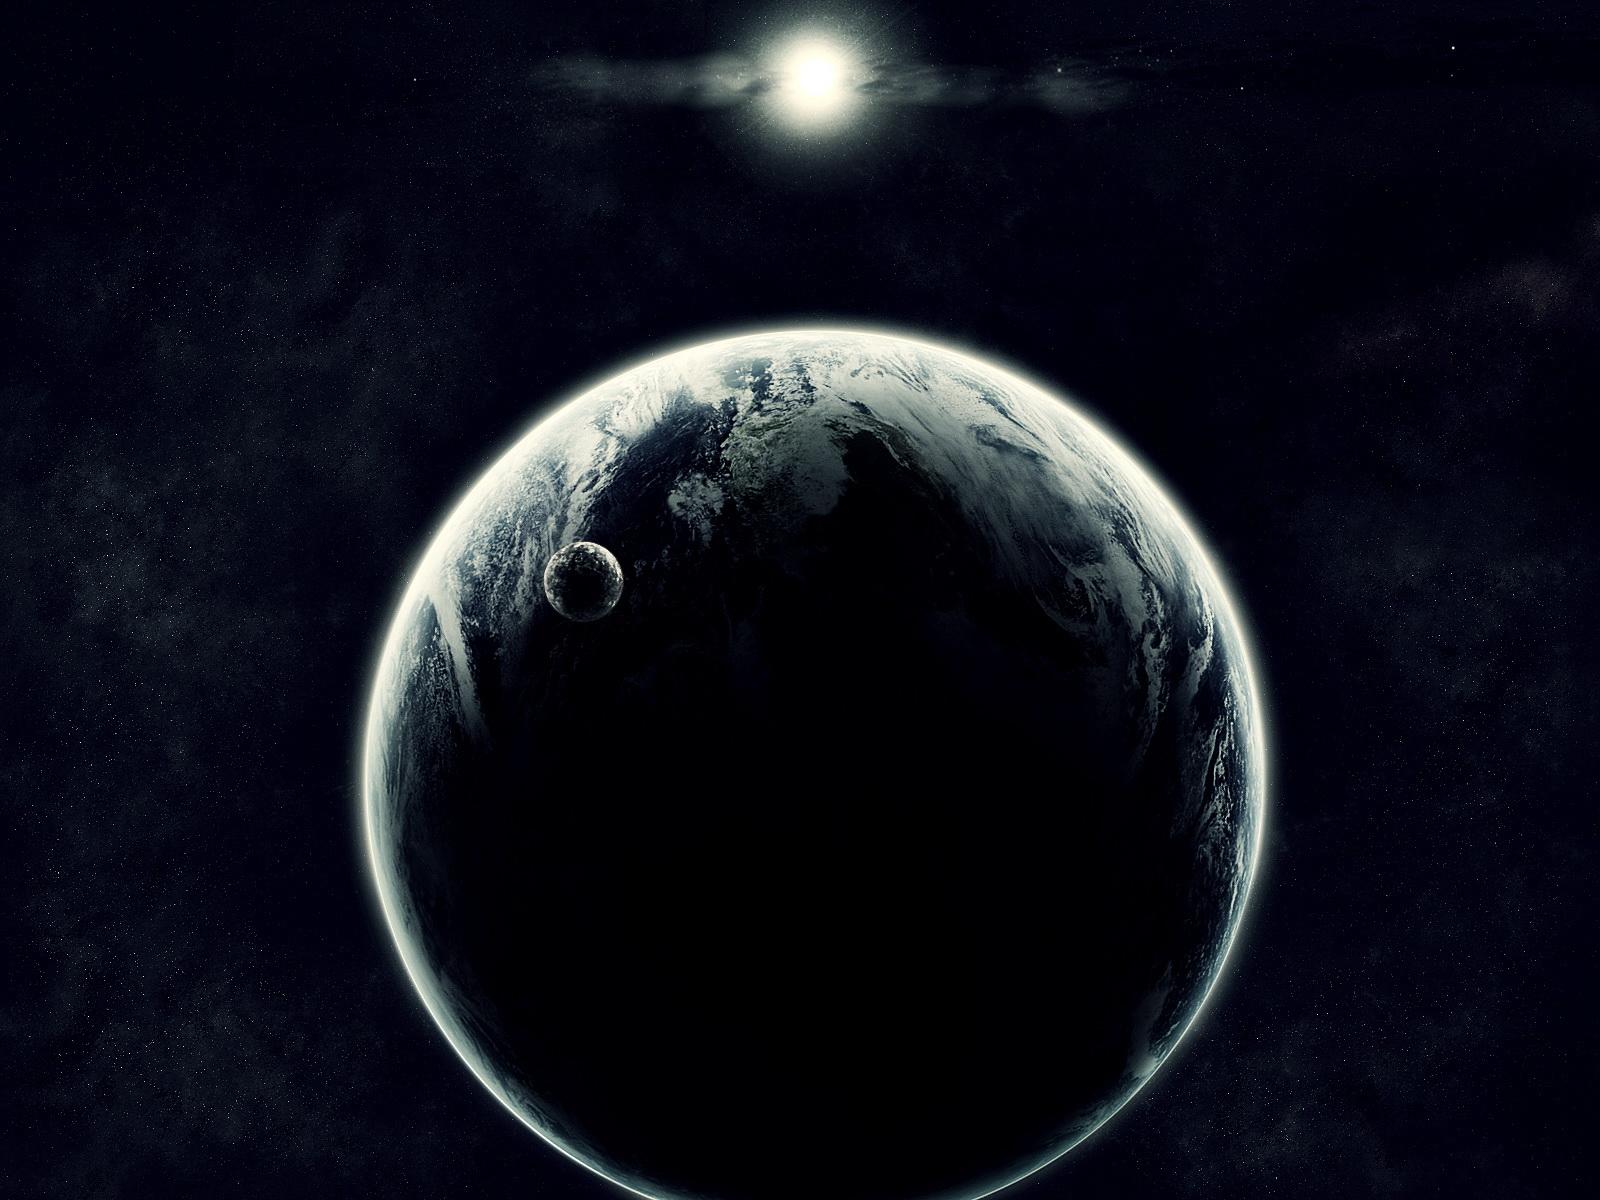 small black hole on earth - photo #42